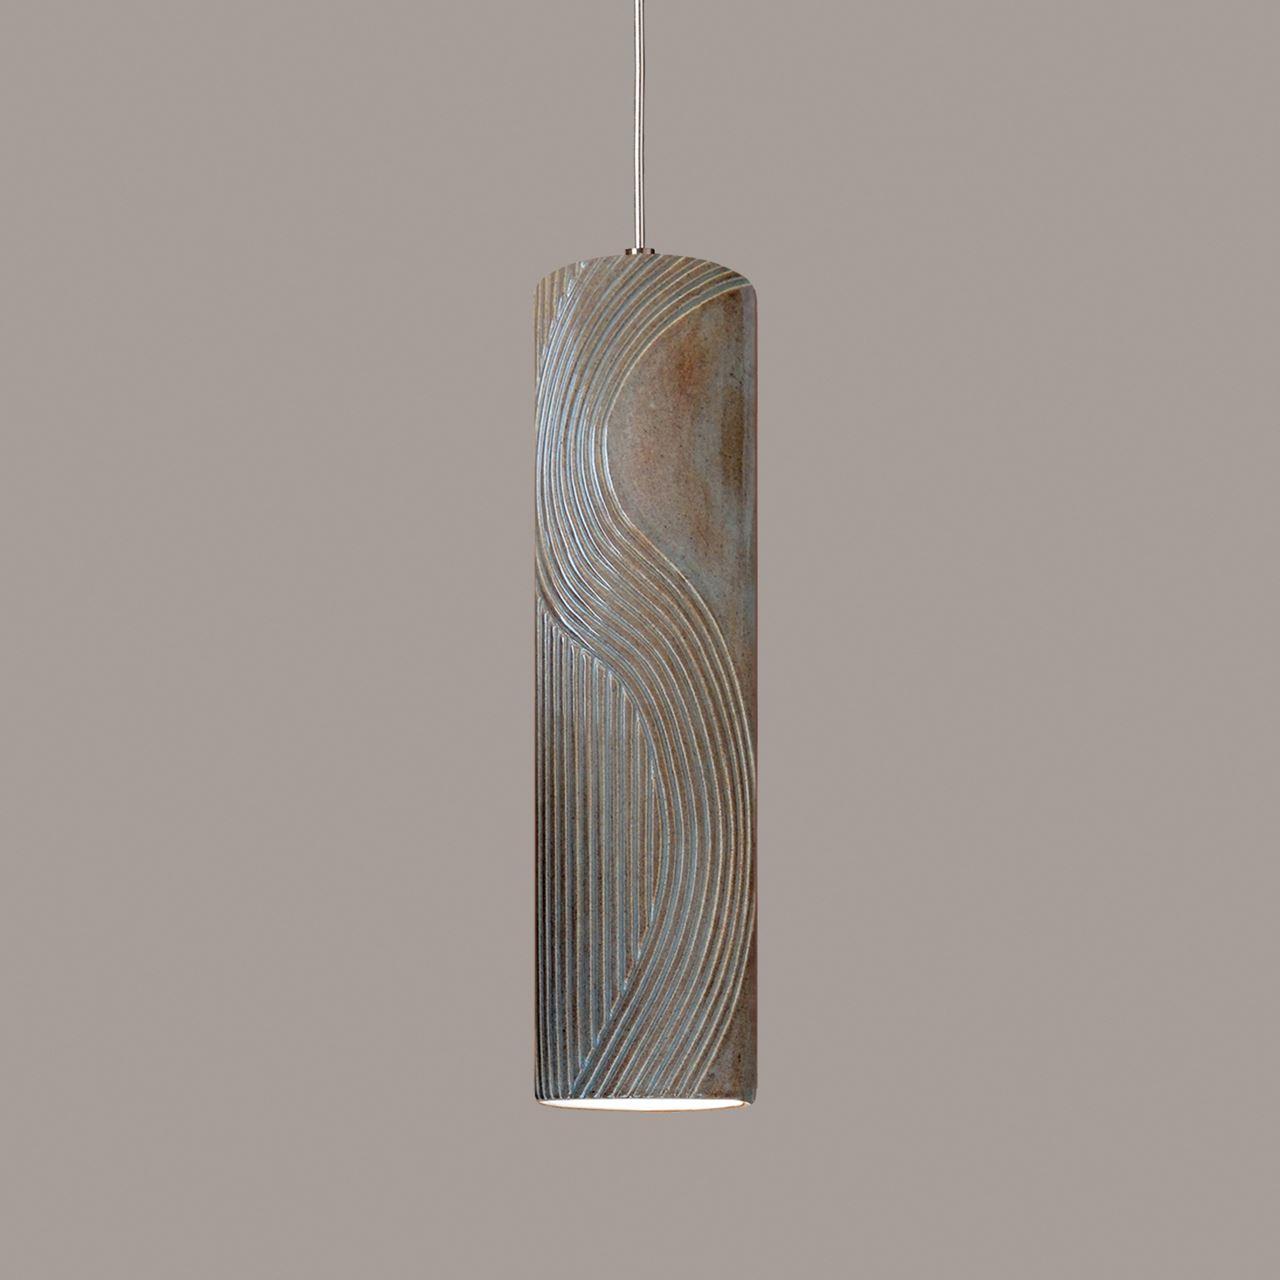 Picture of A19 Ceramic Pendant Light | Crossroads